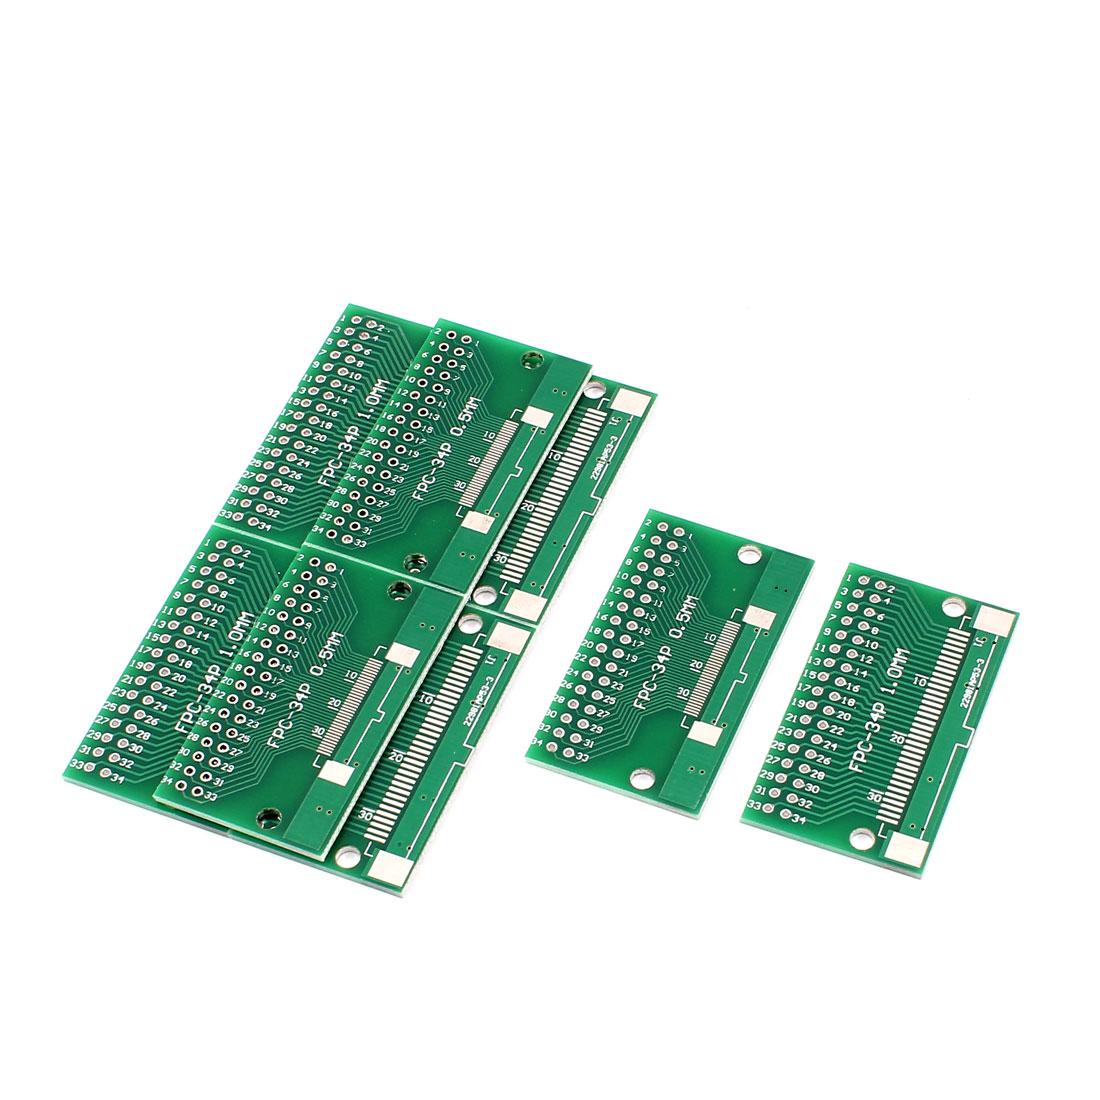 8Pcs 46 x 26mm FPC 34Pins Adapter PCB Converter Board